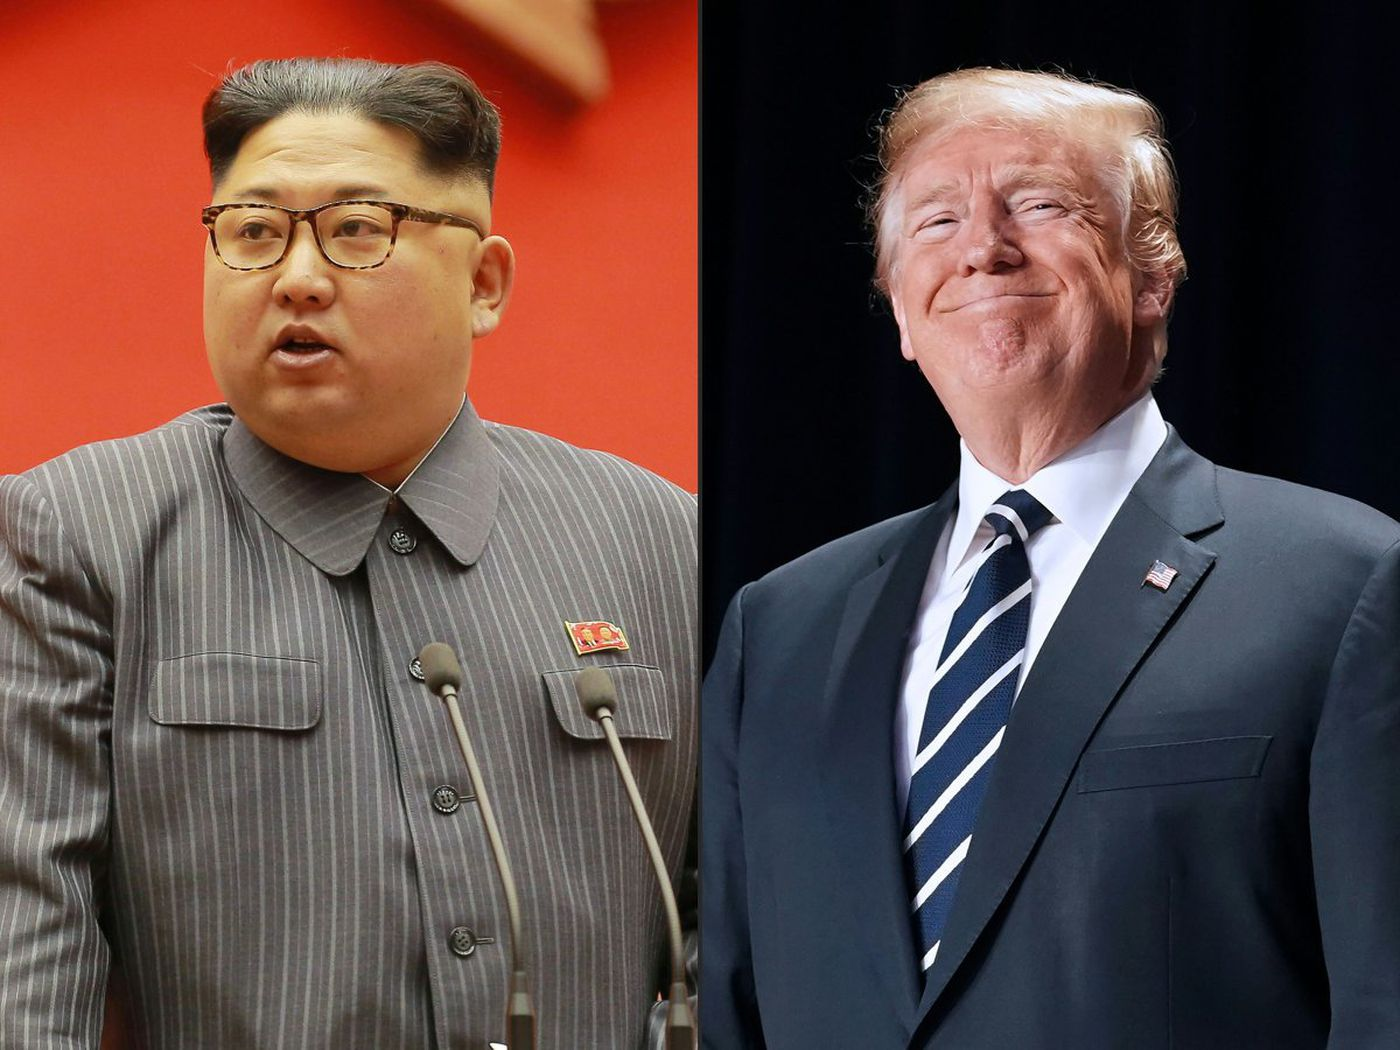 Trump fuming over North Korea's threat to nix Singapore summit https://t.co/4C0p79nexI https://t.co/V3BocFdm2k